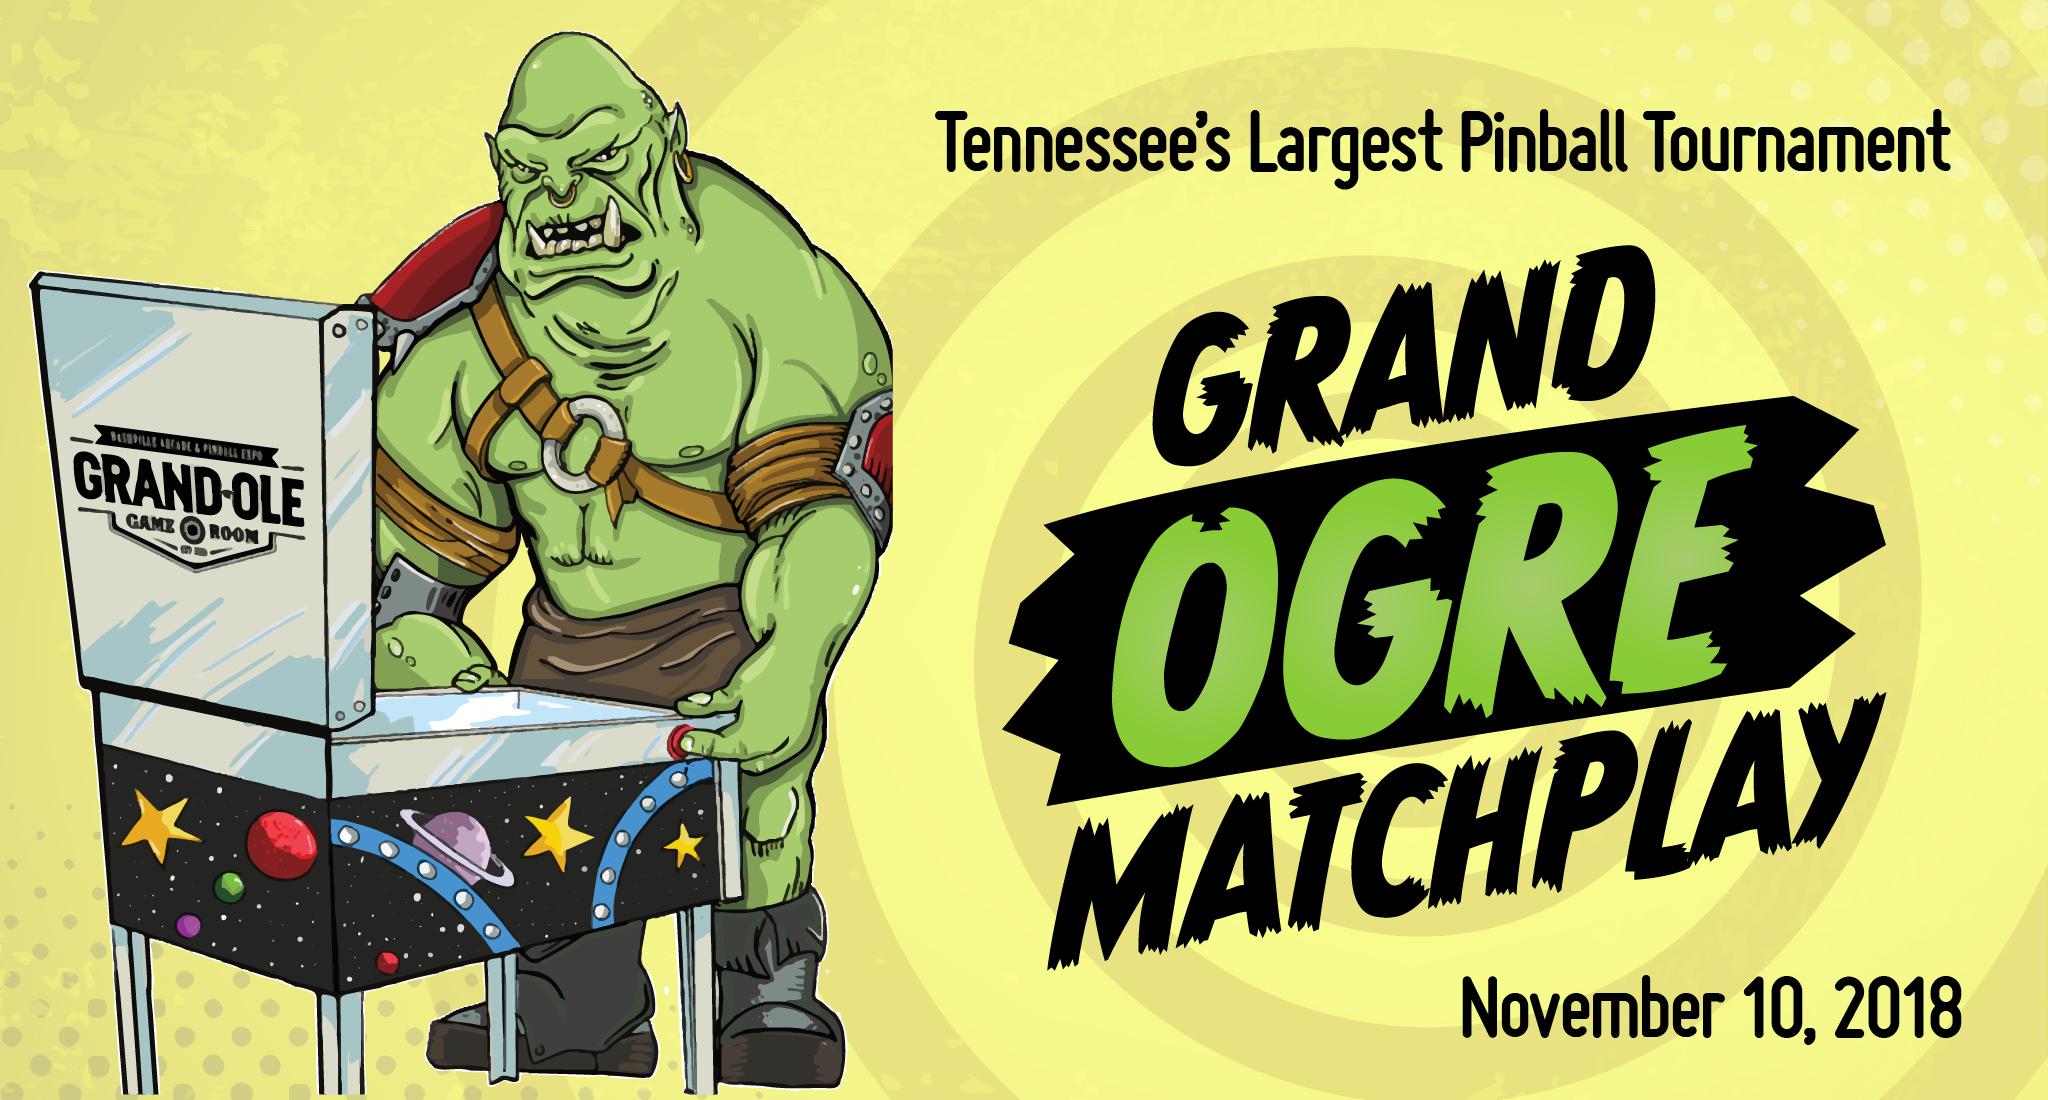 Grand Ogre Matchplay Pinball Tournament